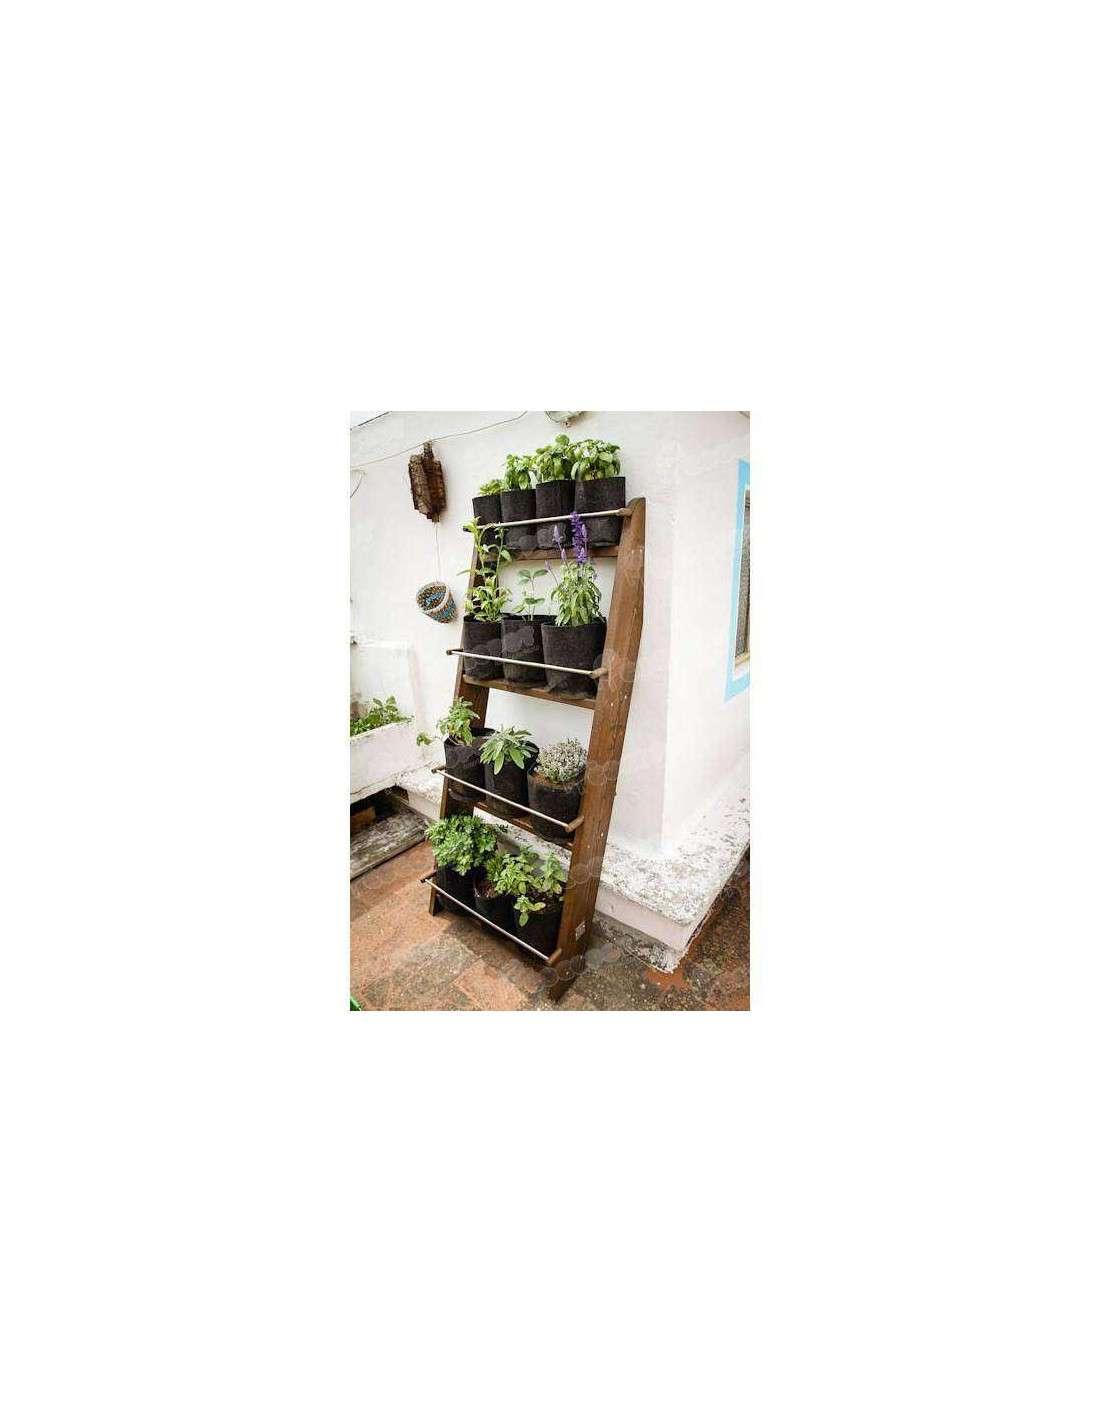 Jardin vertical escalera zurnek por 92 95 en cocopot - Material para jardin vertical ...